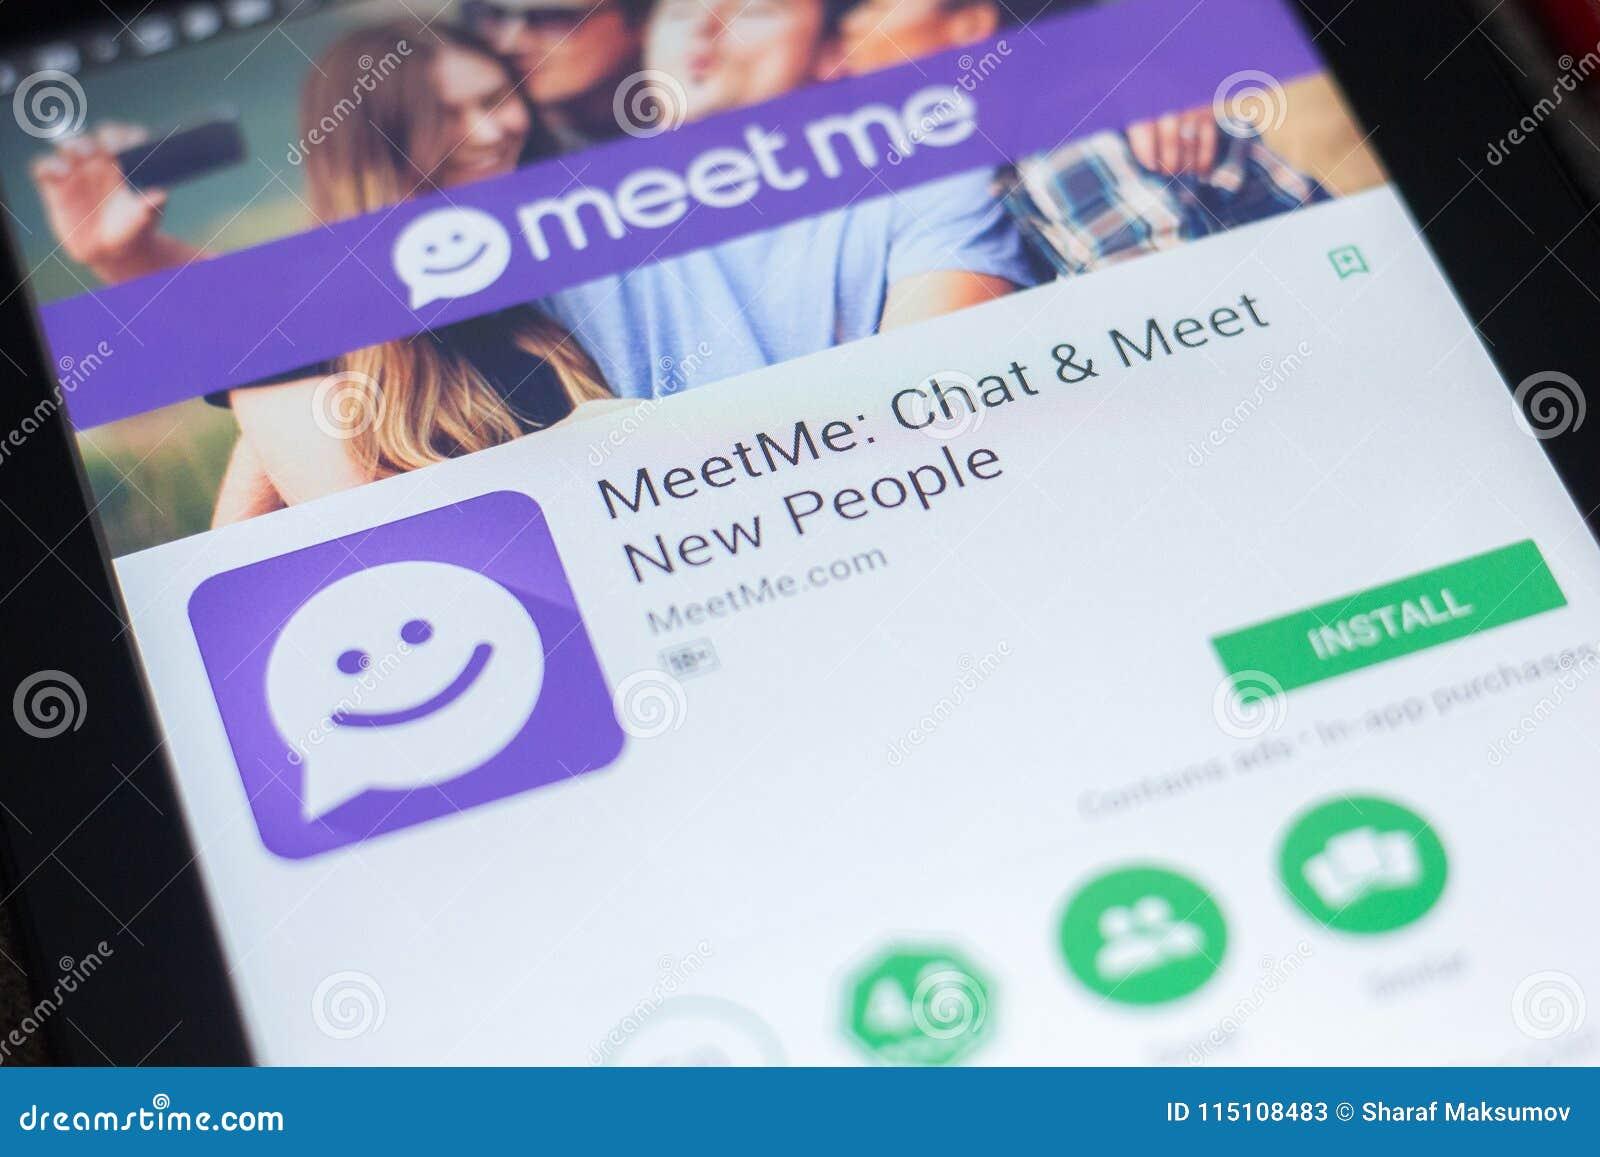 meetme download